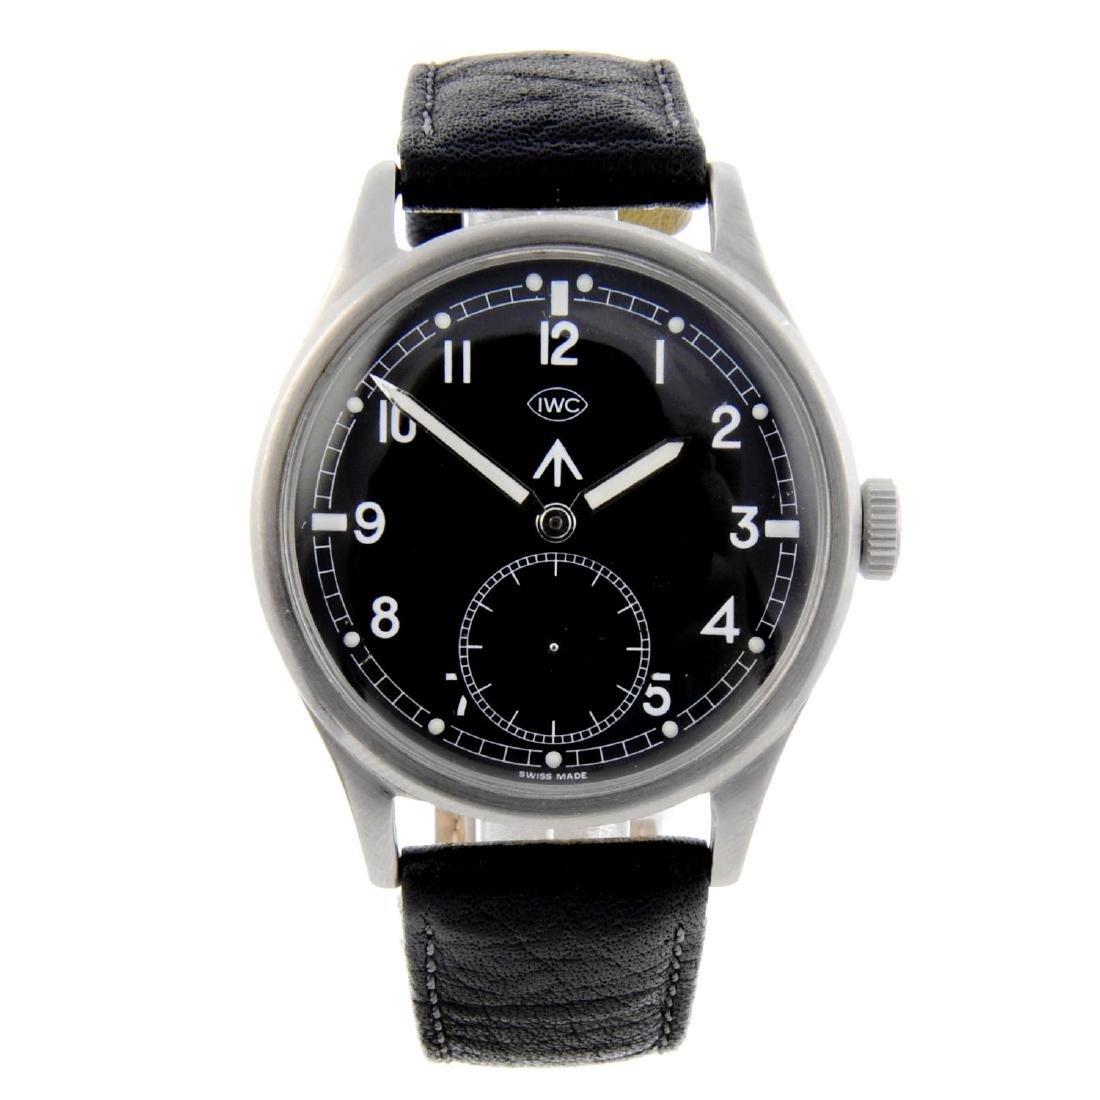 IWC - a gentleman's Mk 10 military issue wrist watch.